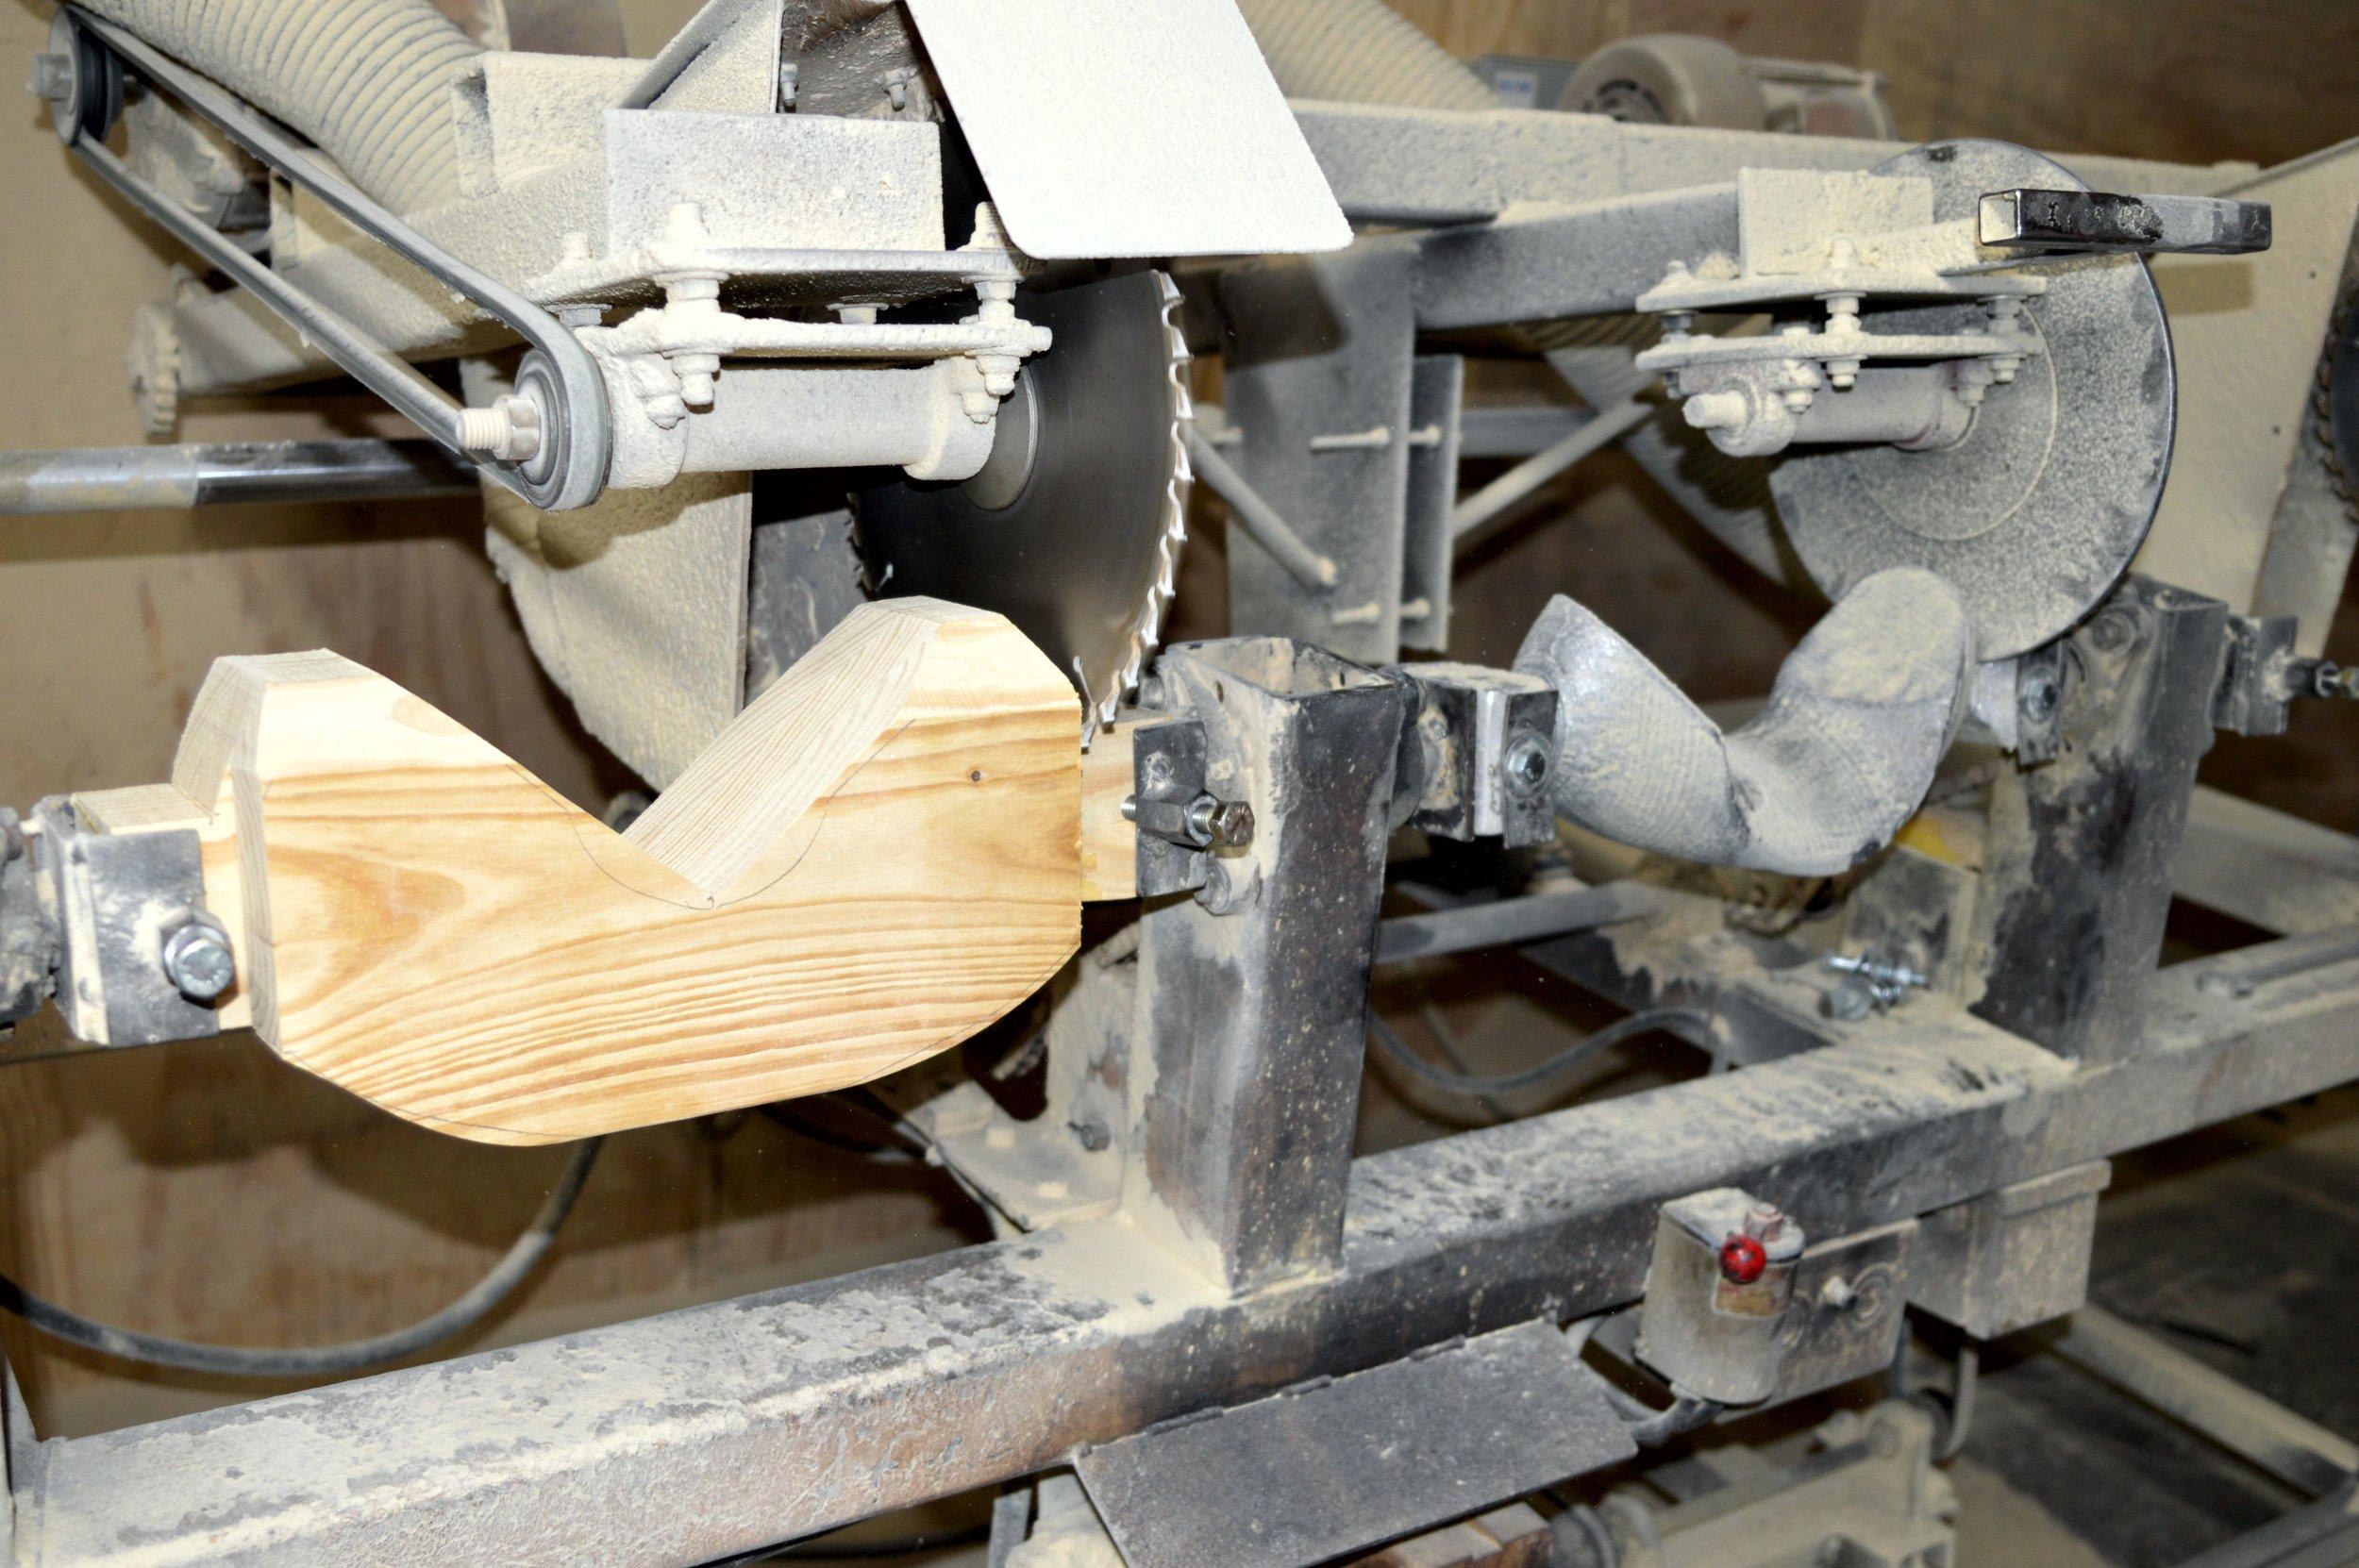 2.wood block in saw.jpg